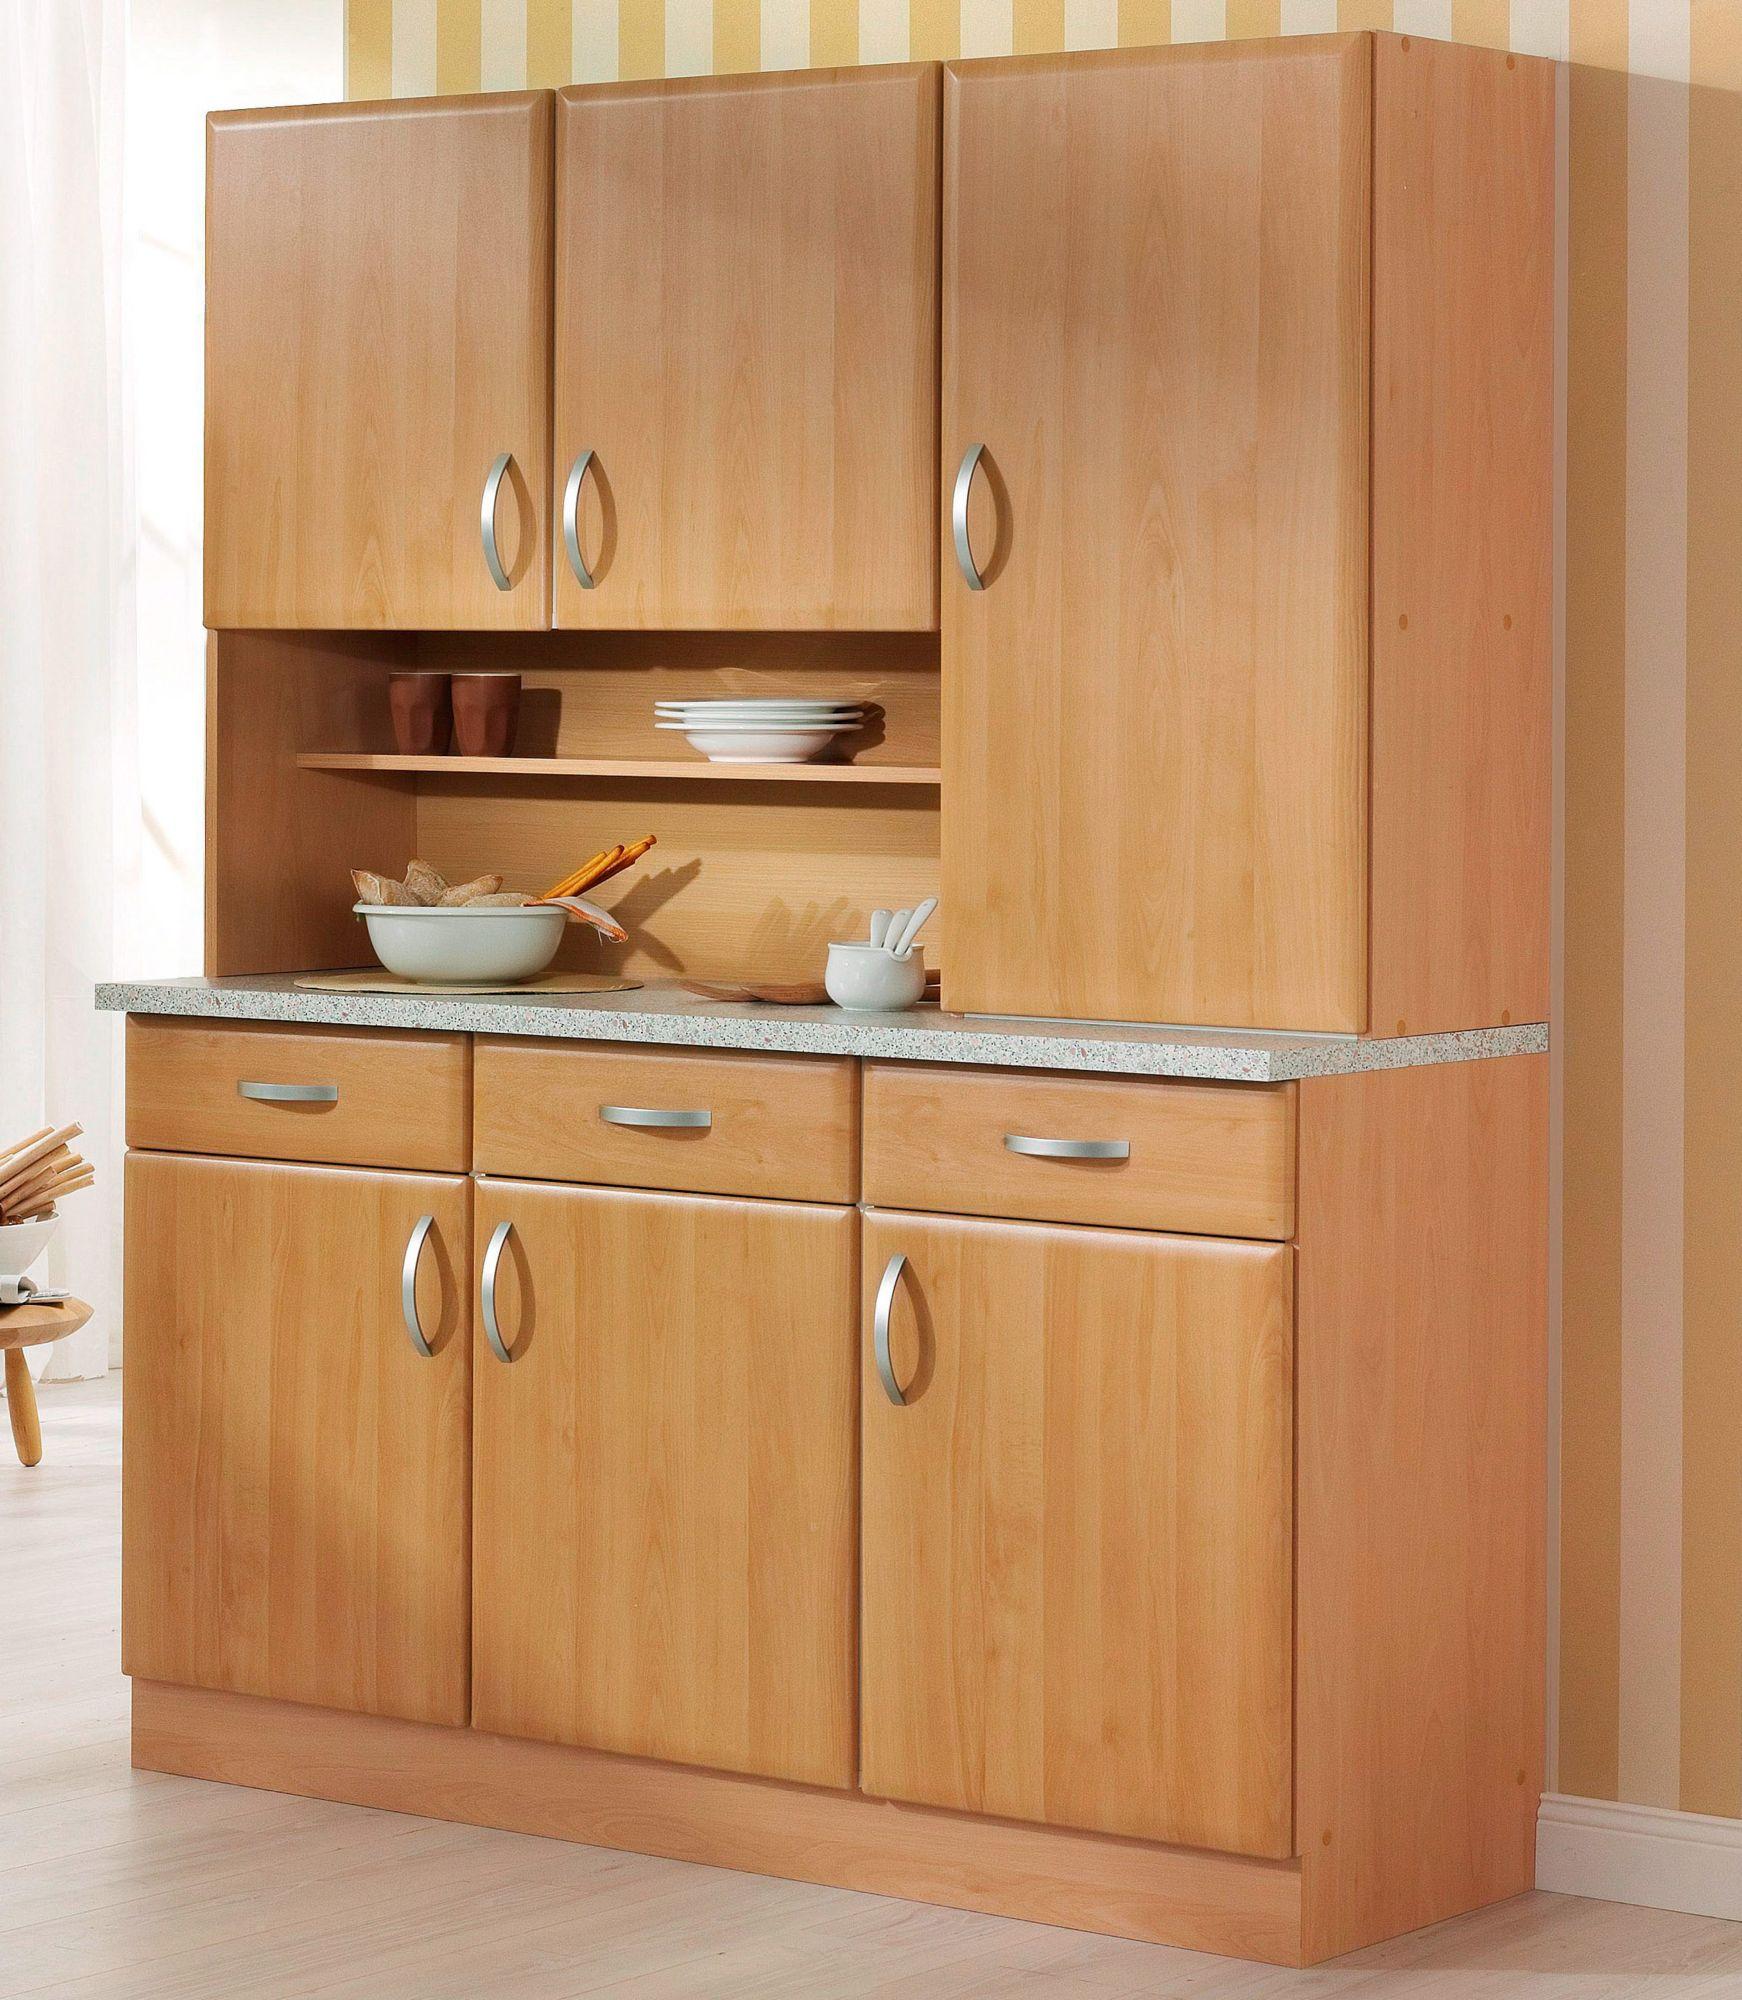 k chenbuffet prag breite 150 cm schwab versand buffetschr nke. Black Bedroom Furniture Sets. Home Design Ideas